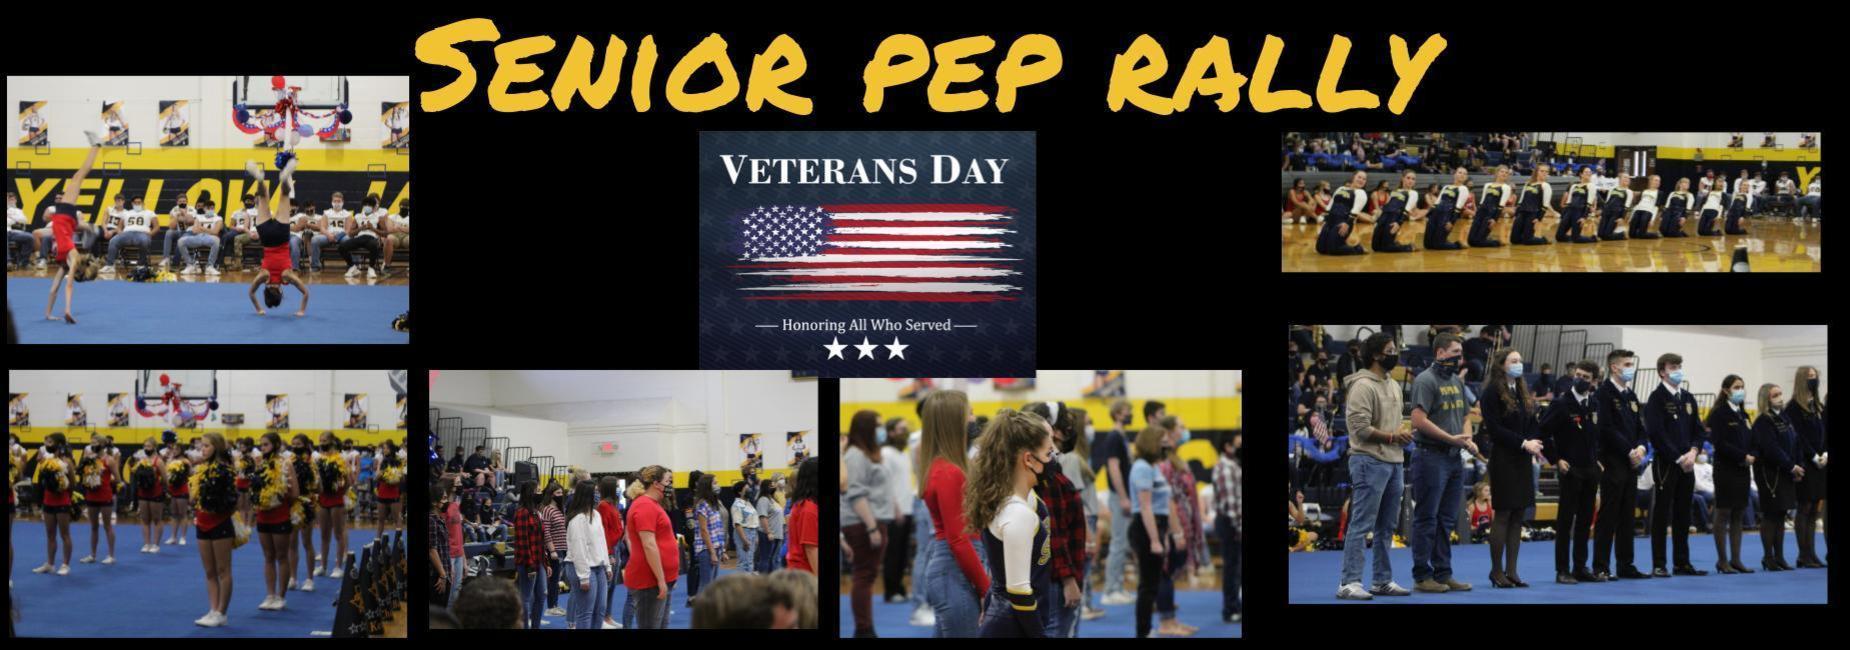 Veterans pep rally